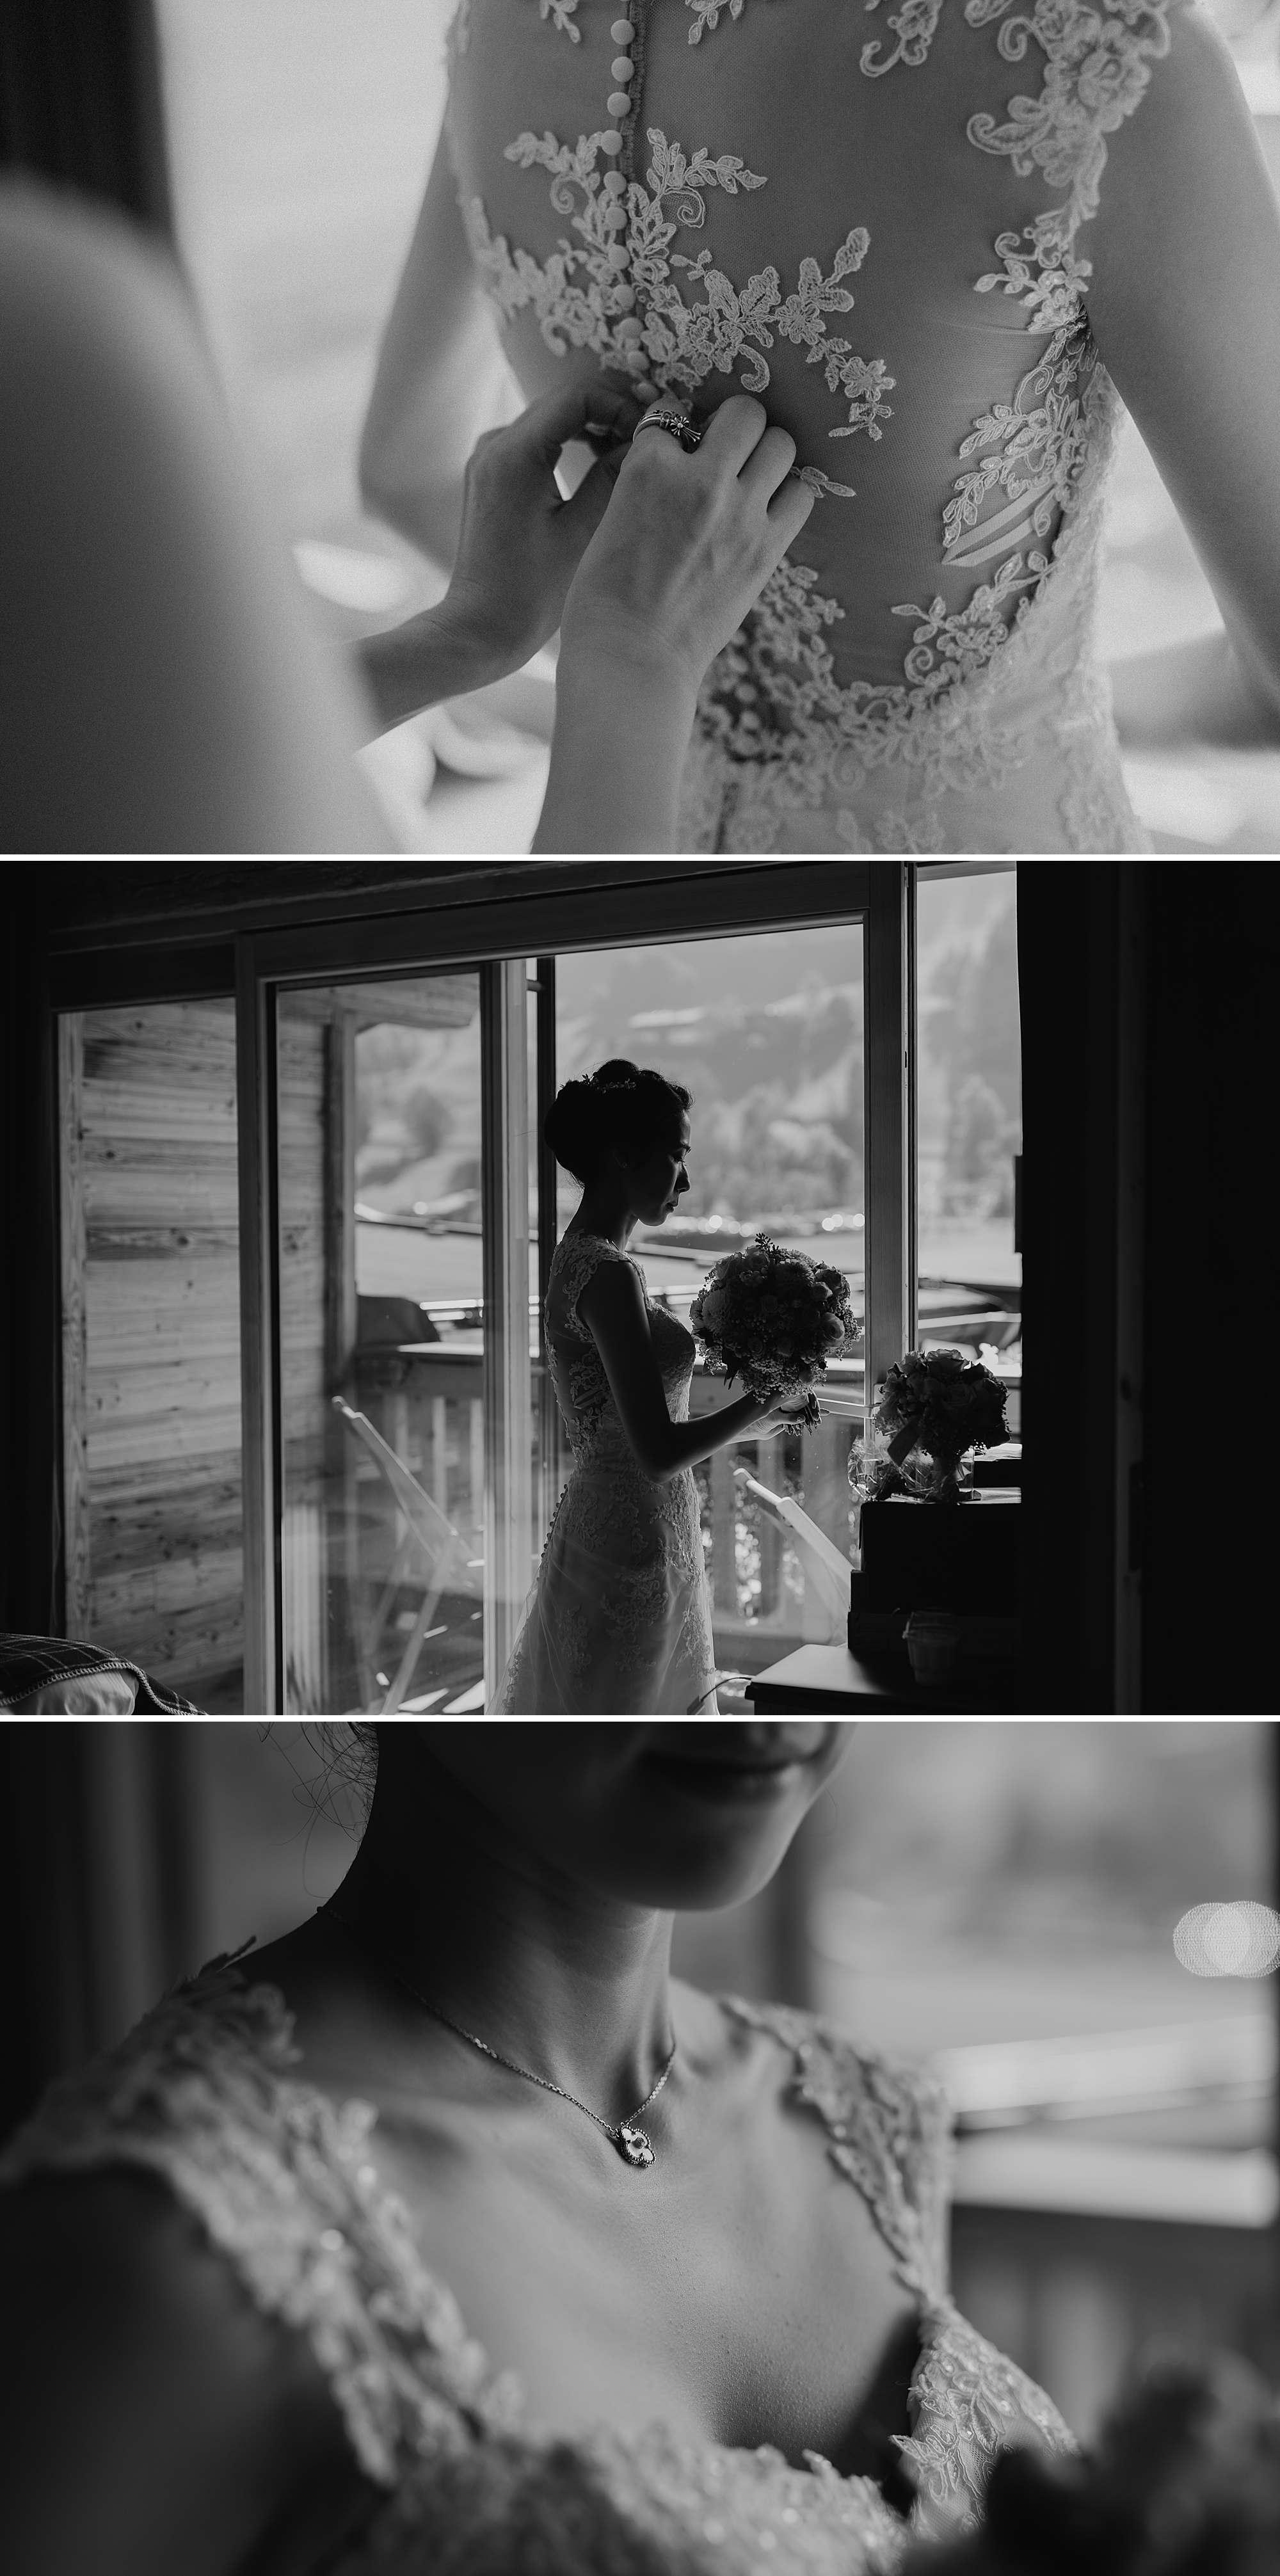 kitzbuehel wedding photographer_0086.jpg